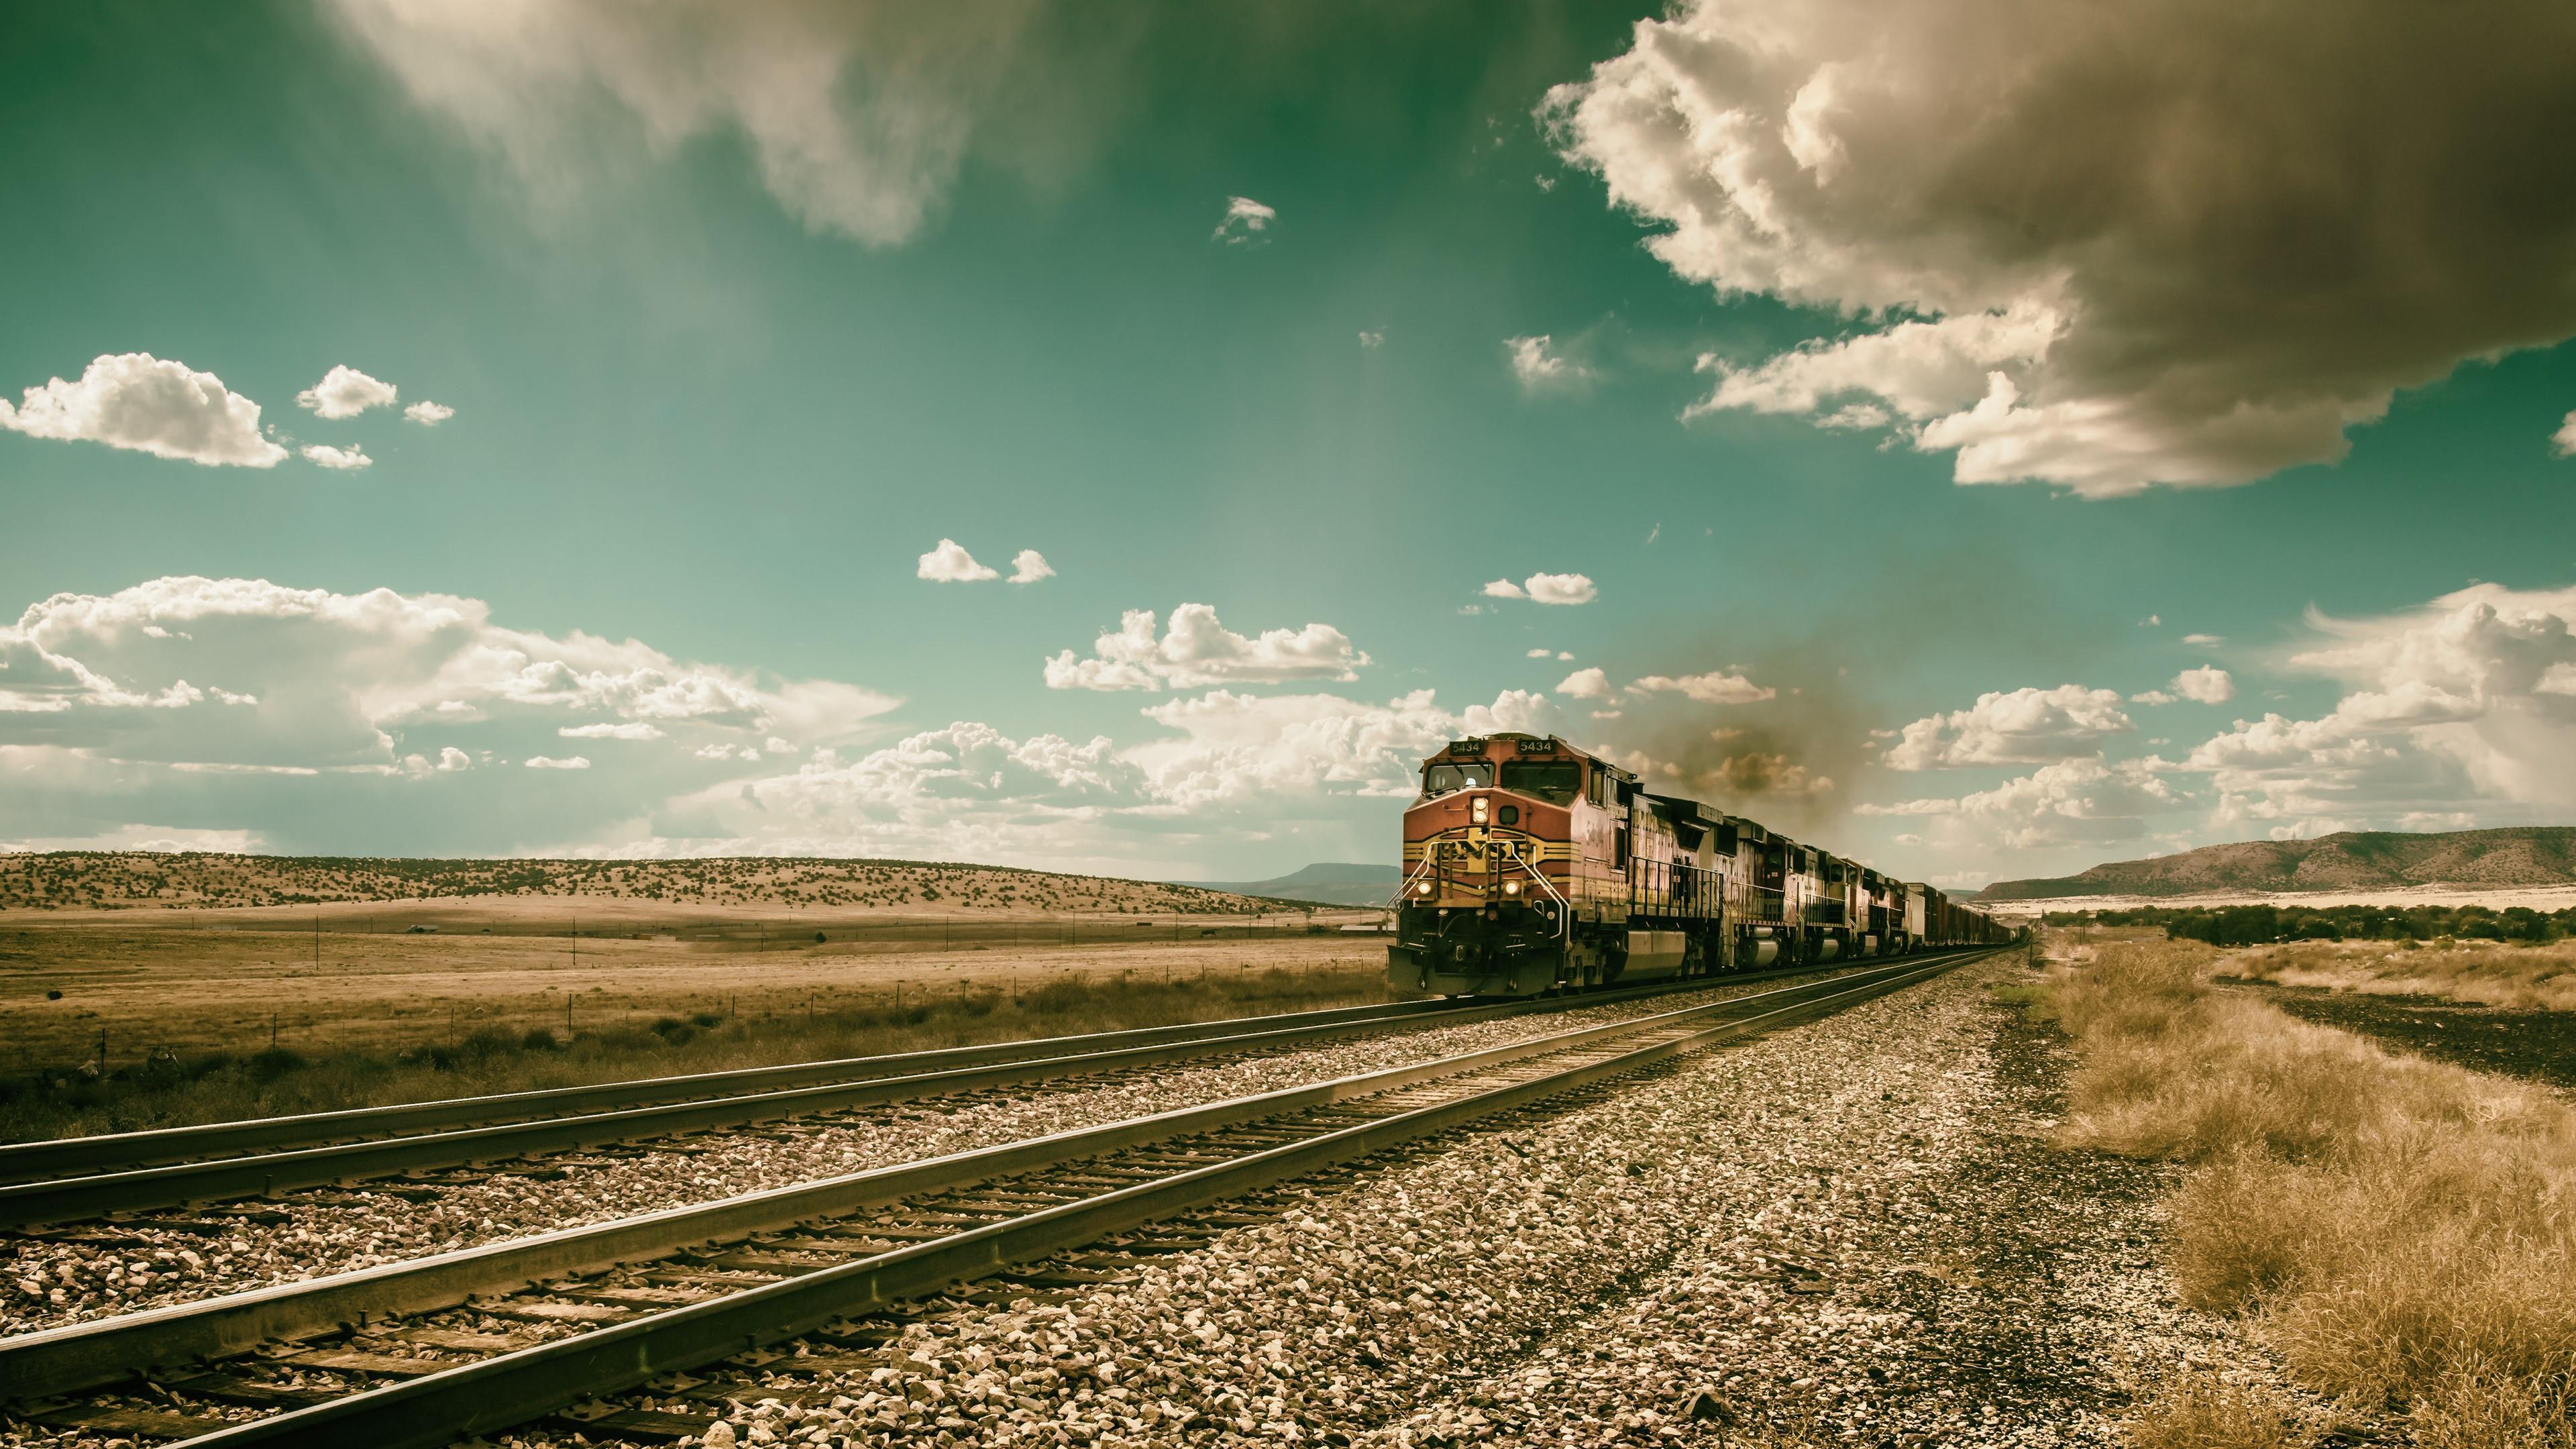 Preview Train